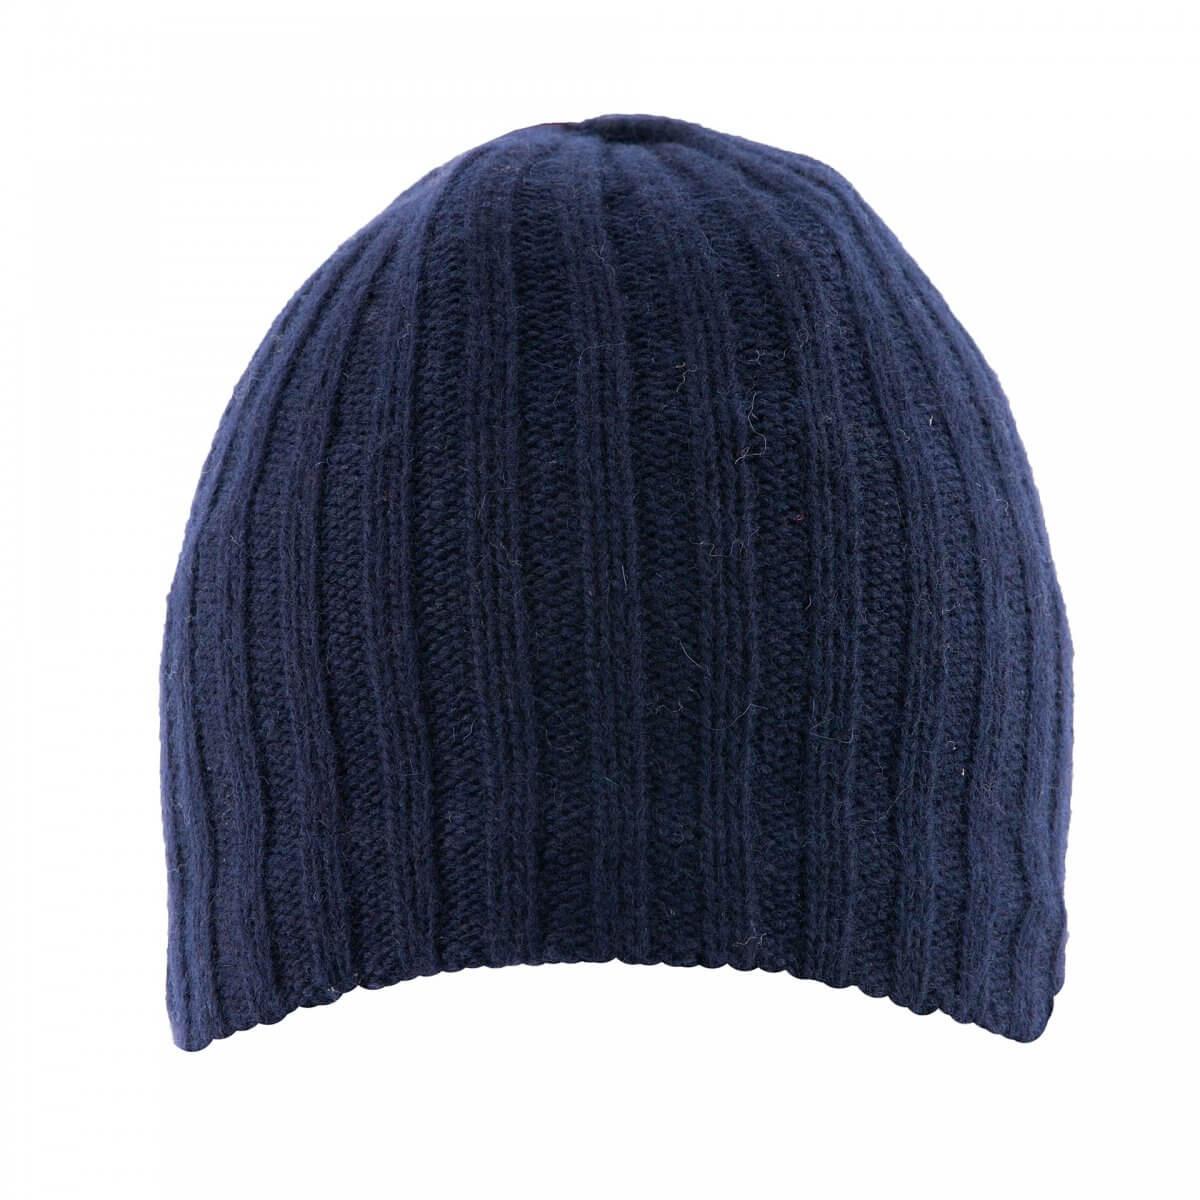 Wool Beanie Hat in Navy Blue